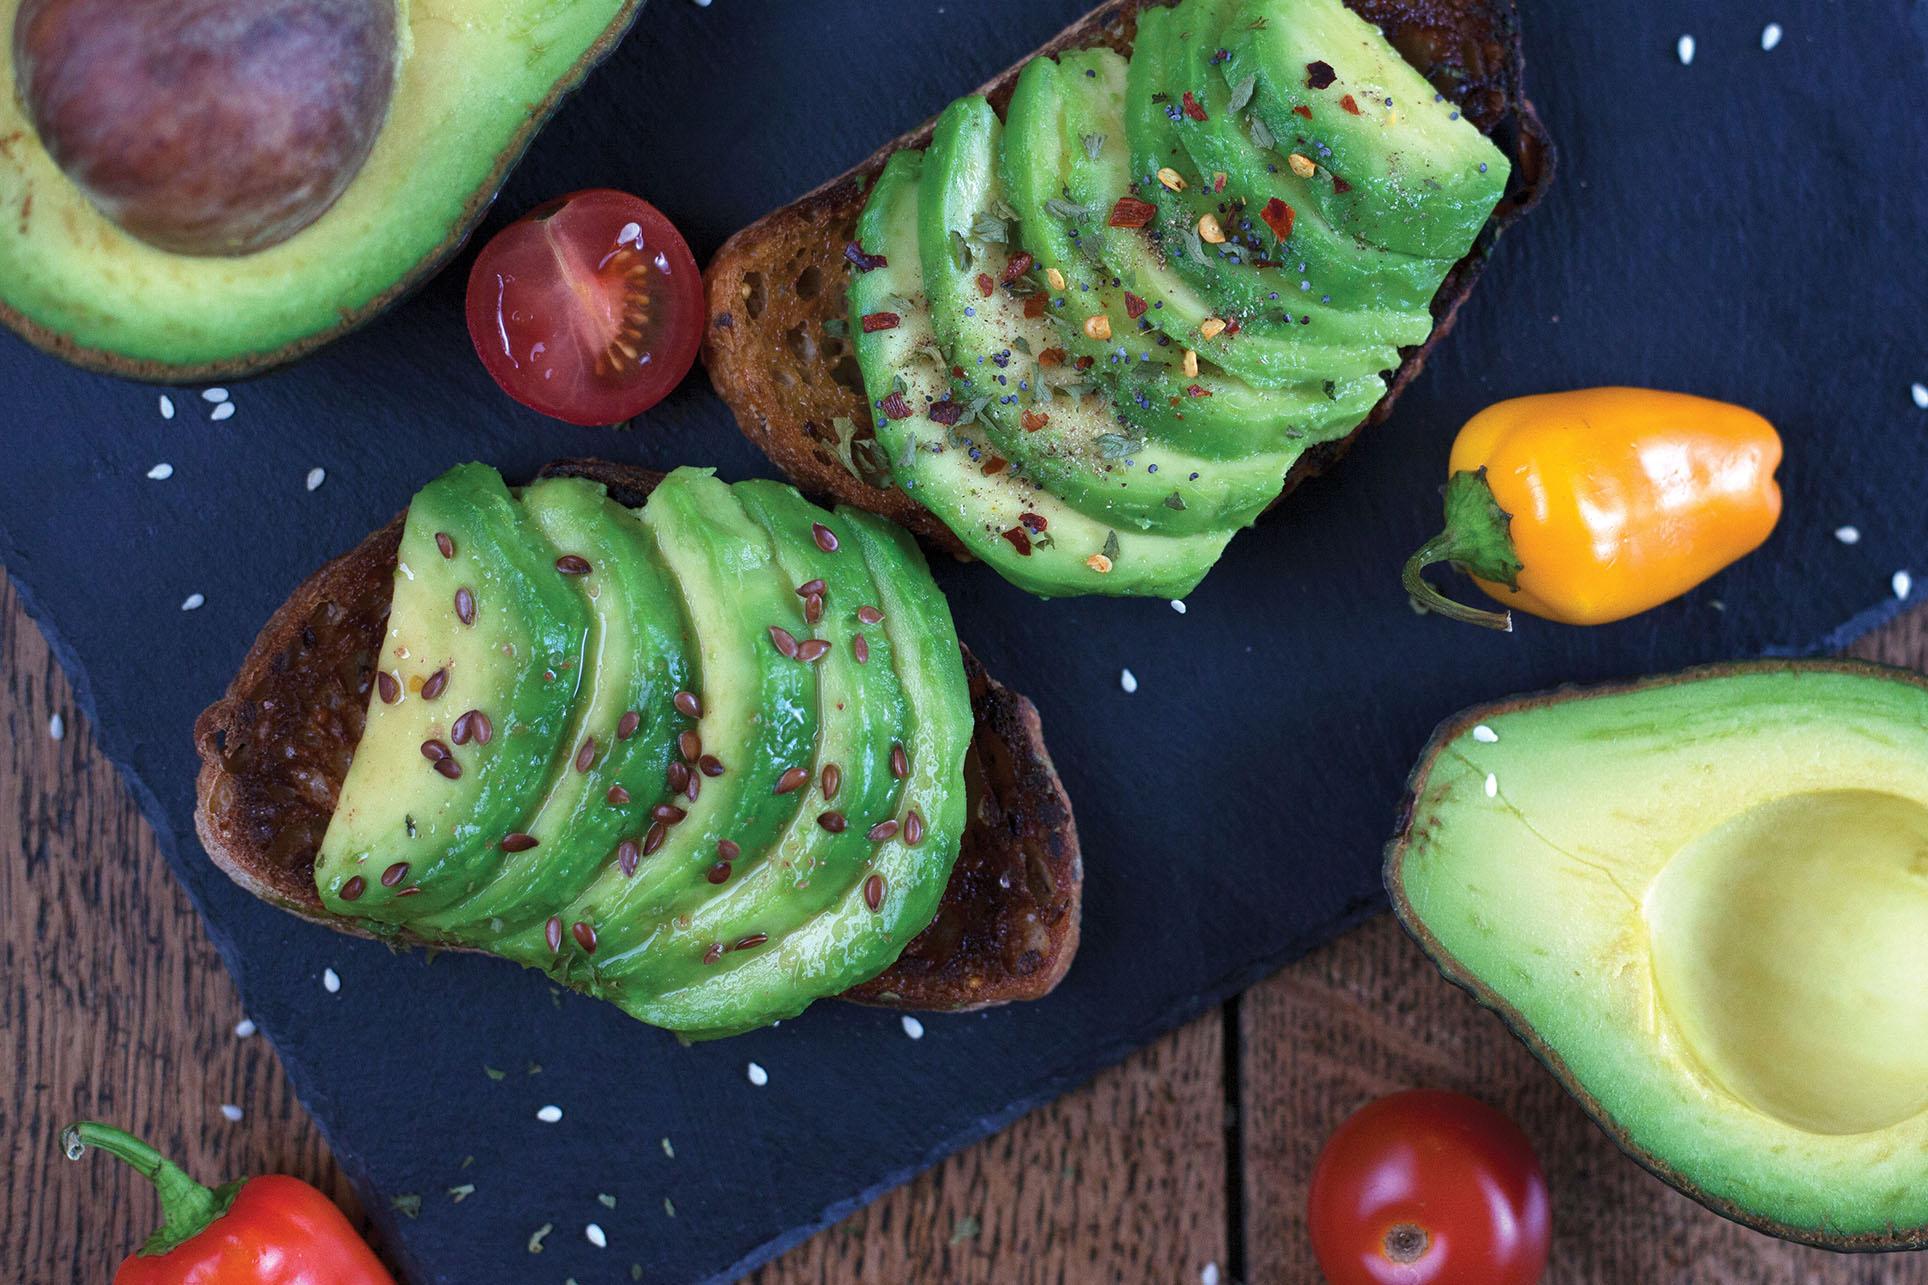 Gourmet avocado toast, with tomatoes, peppers, sesame seeds, and sea salt. (Photo by Kjokkenutstyr Net.)